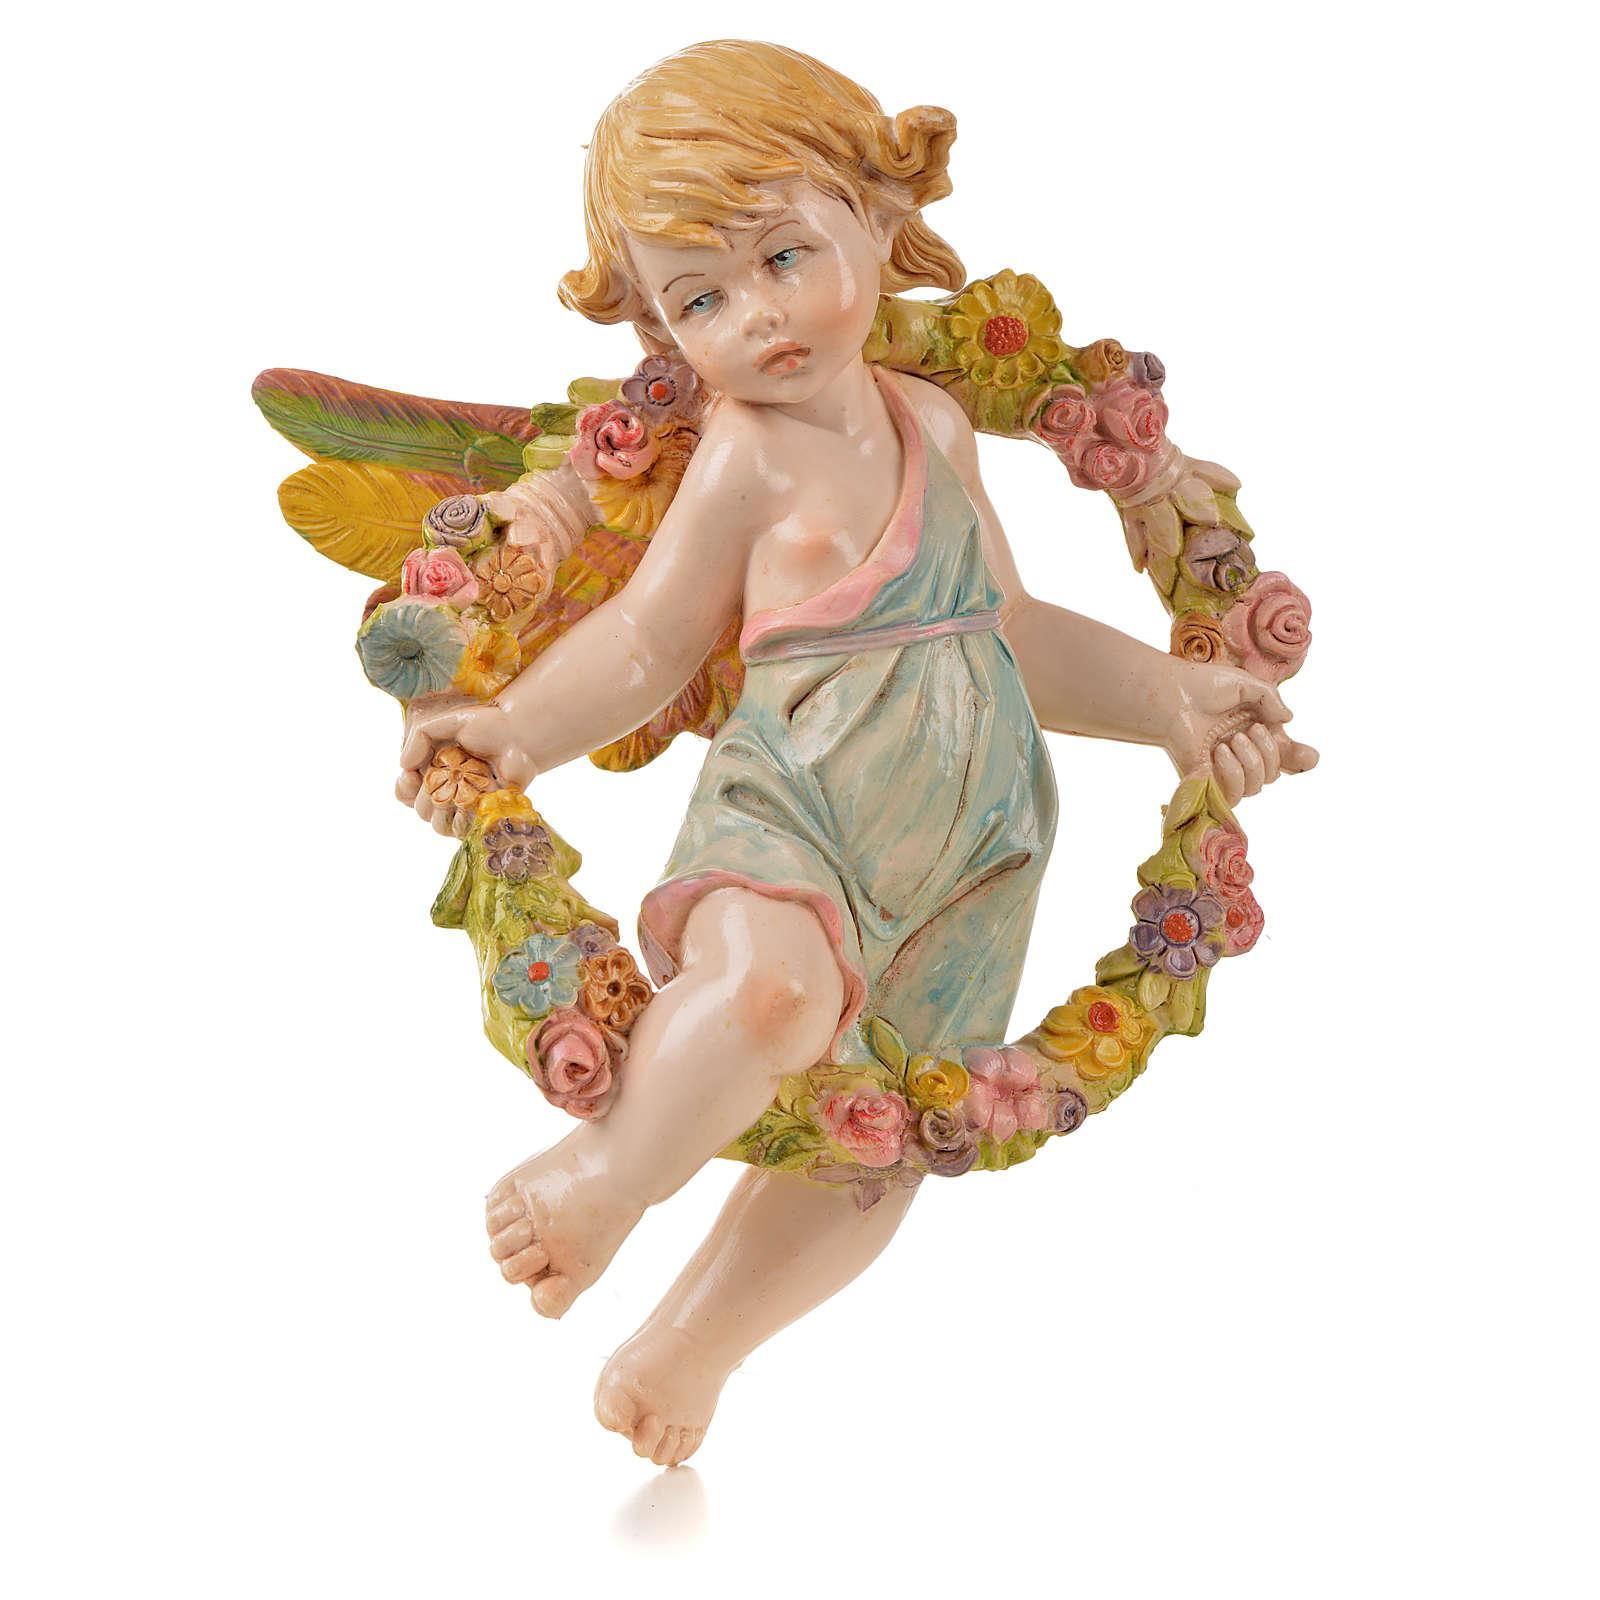 Ángel de la primavera con flores Fontanini símil porcelana para belén de altura media 17 cm 3